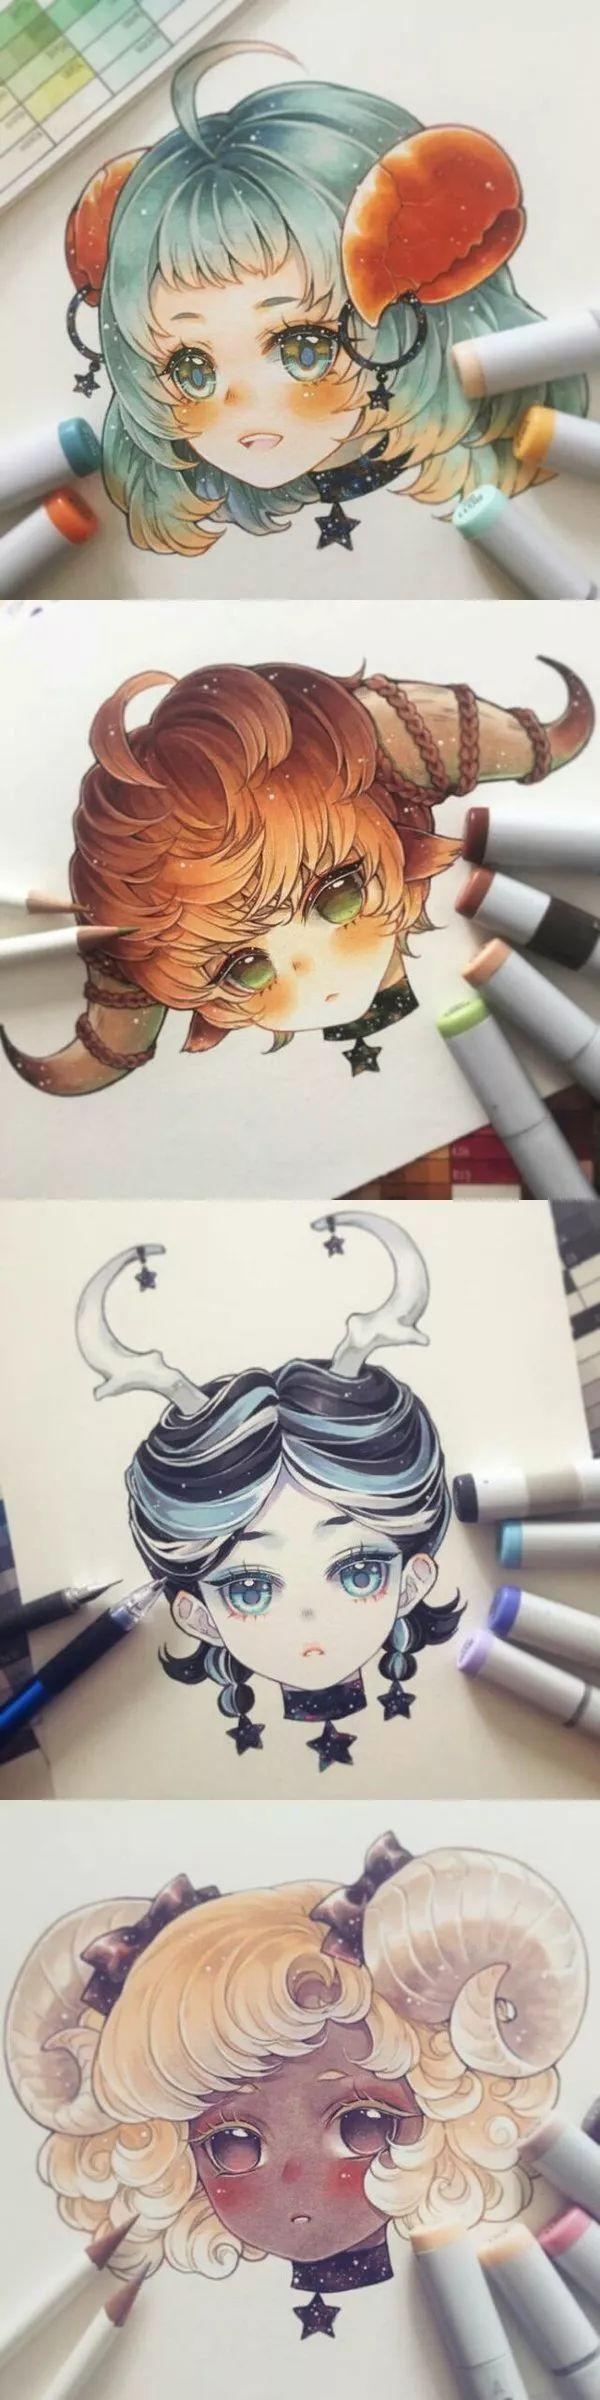 q版卡通-插画师马克笔手绘十二星座